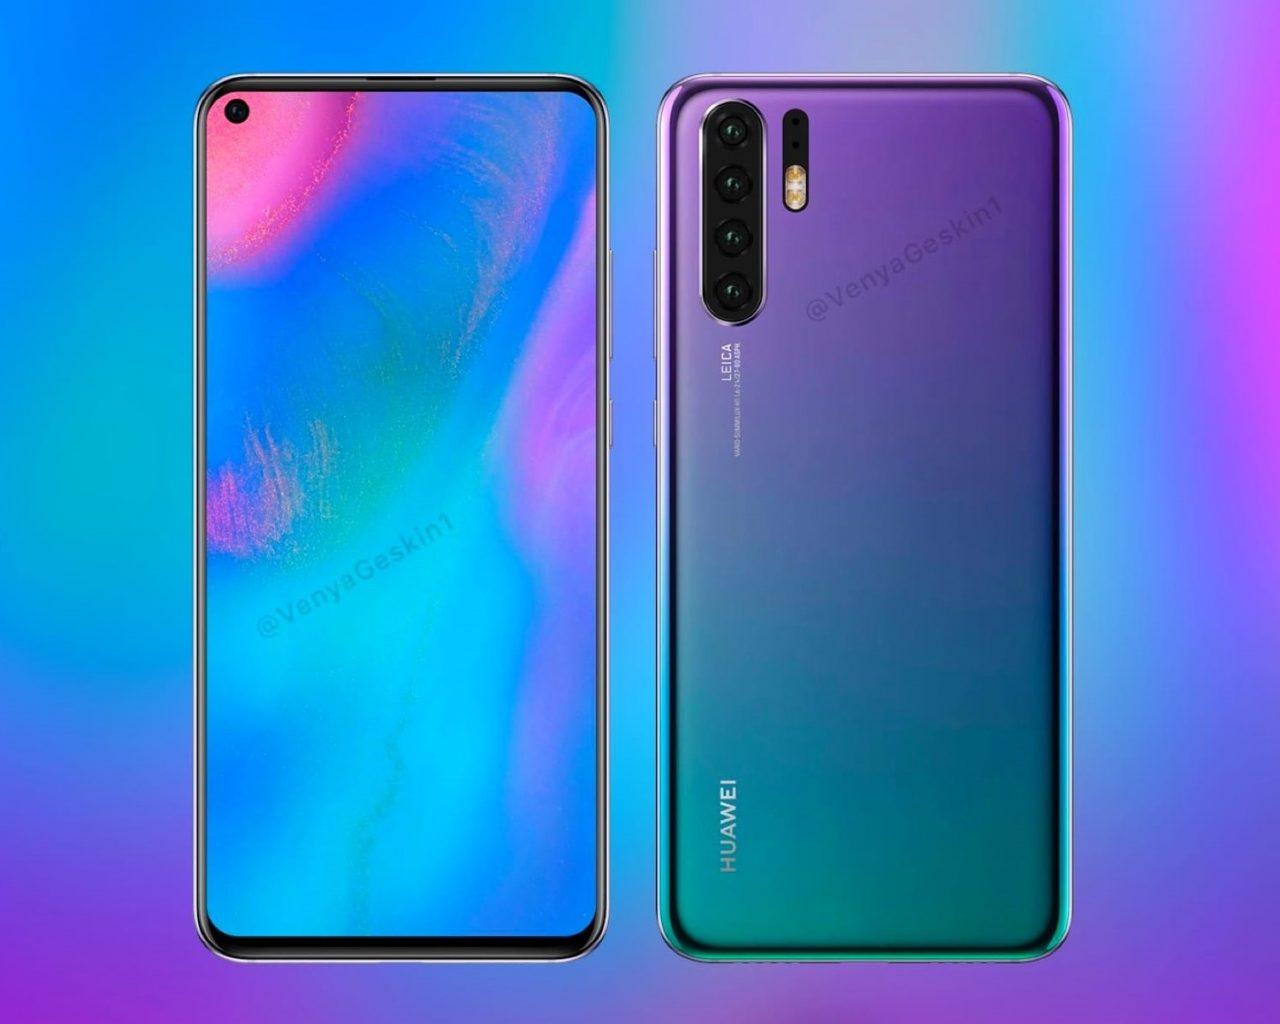 Huawei тизерит наличие «супер зума» в новых флагманских смартфонах Huawei P30